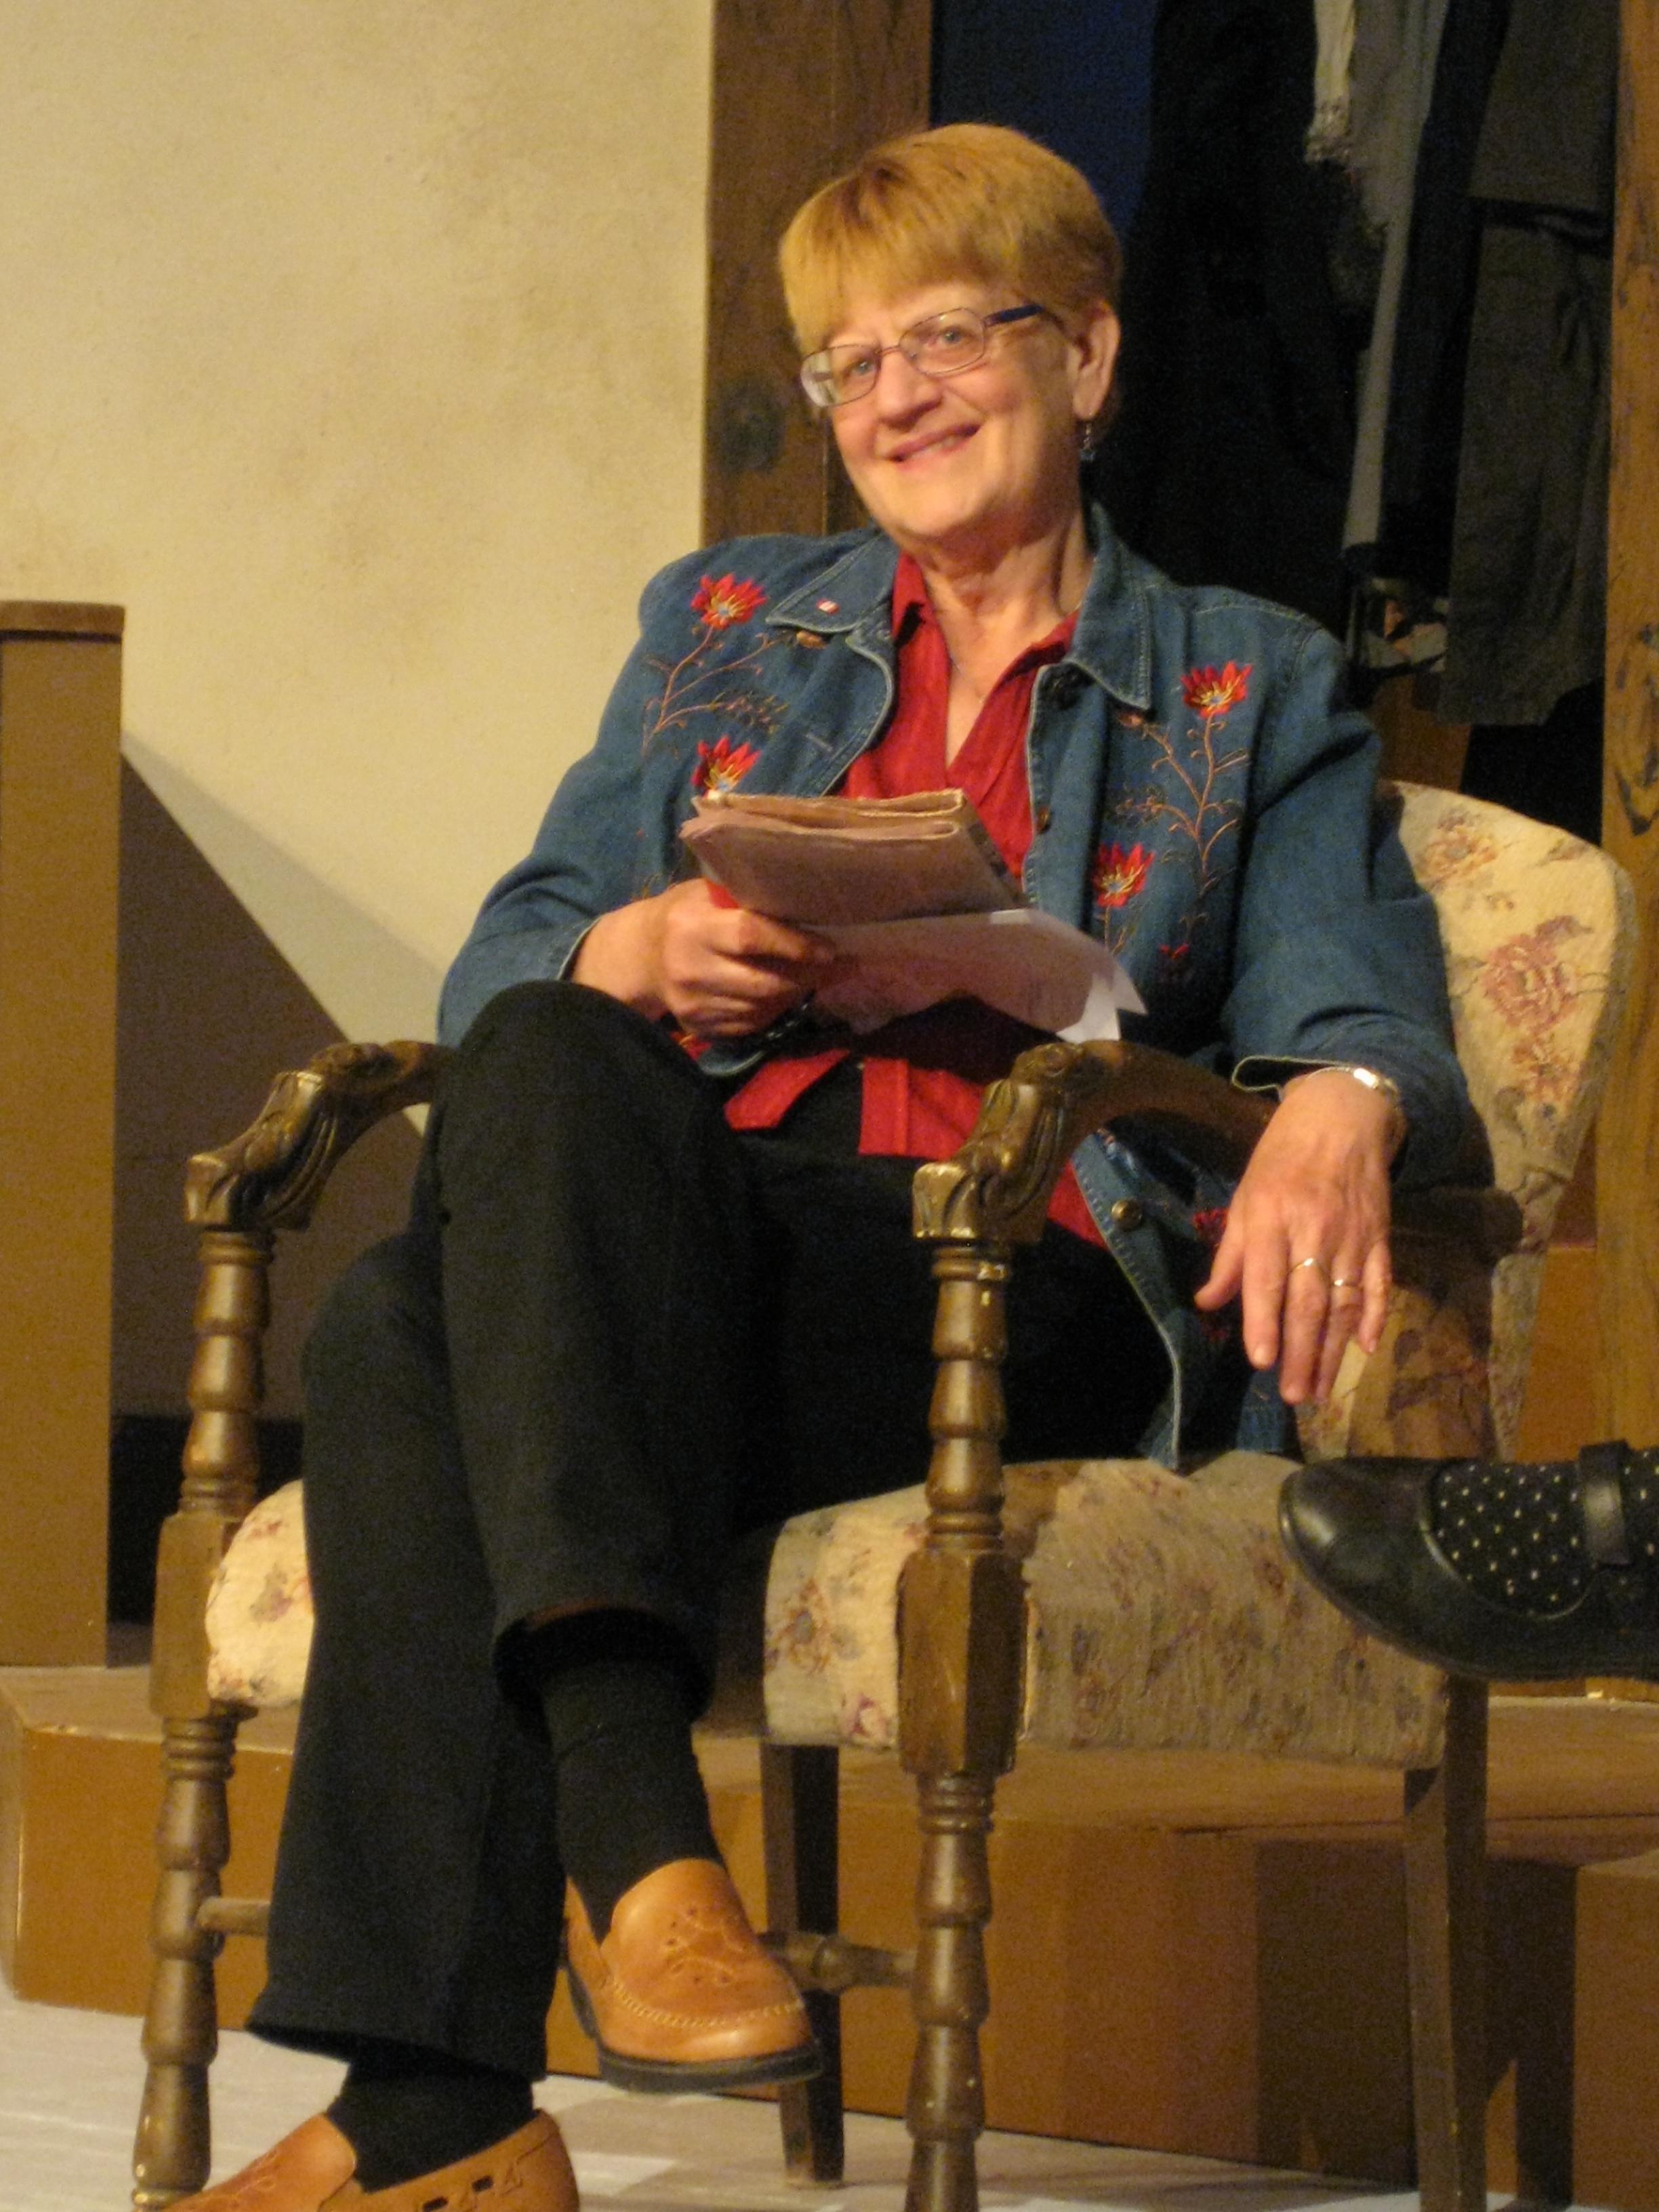 DARLENE REYNOLDS / Props Mistress & Co-Set Decorator (sitting on the job again).